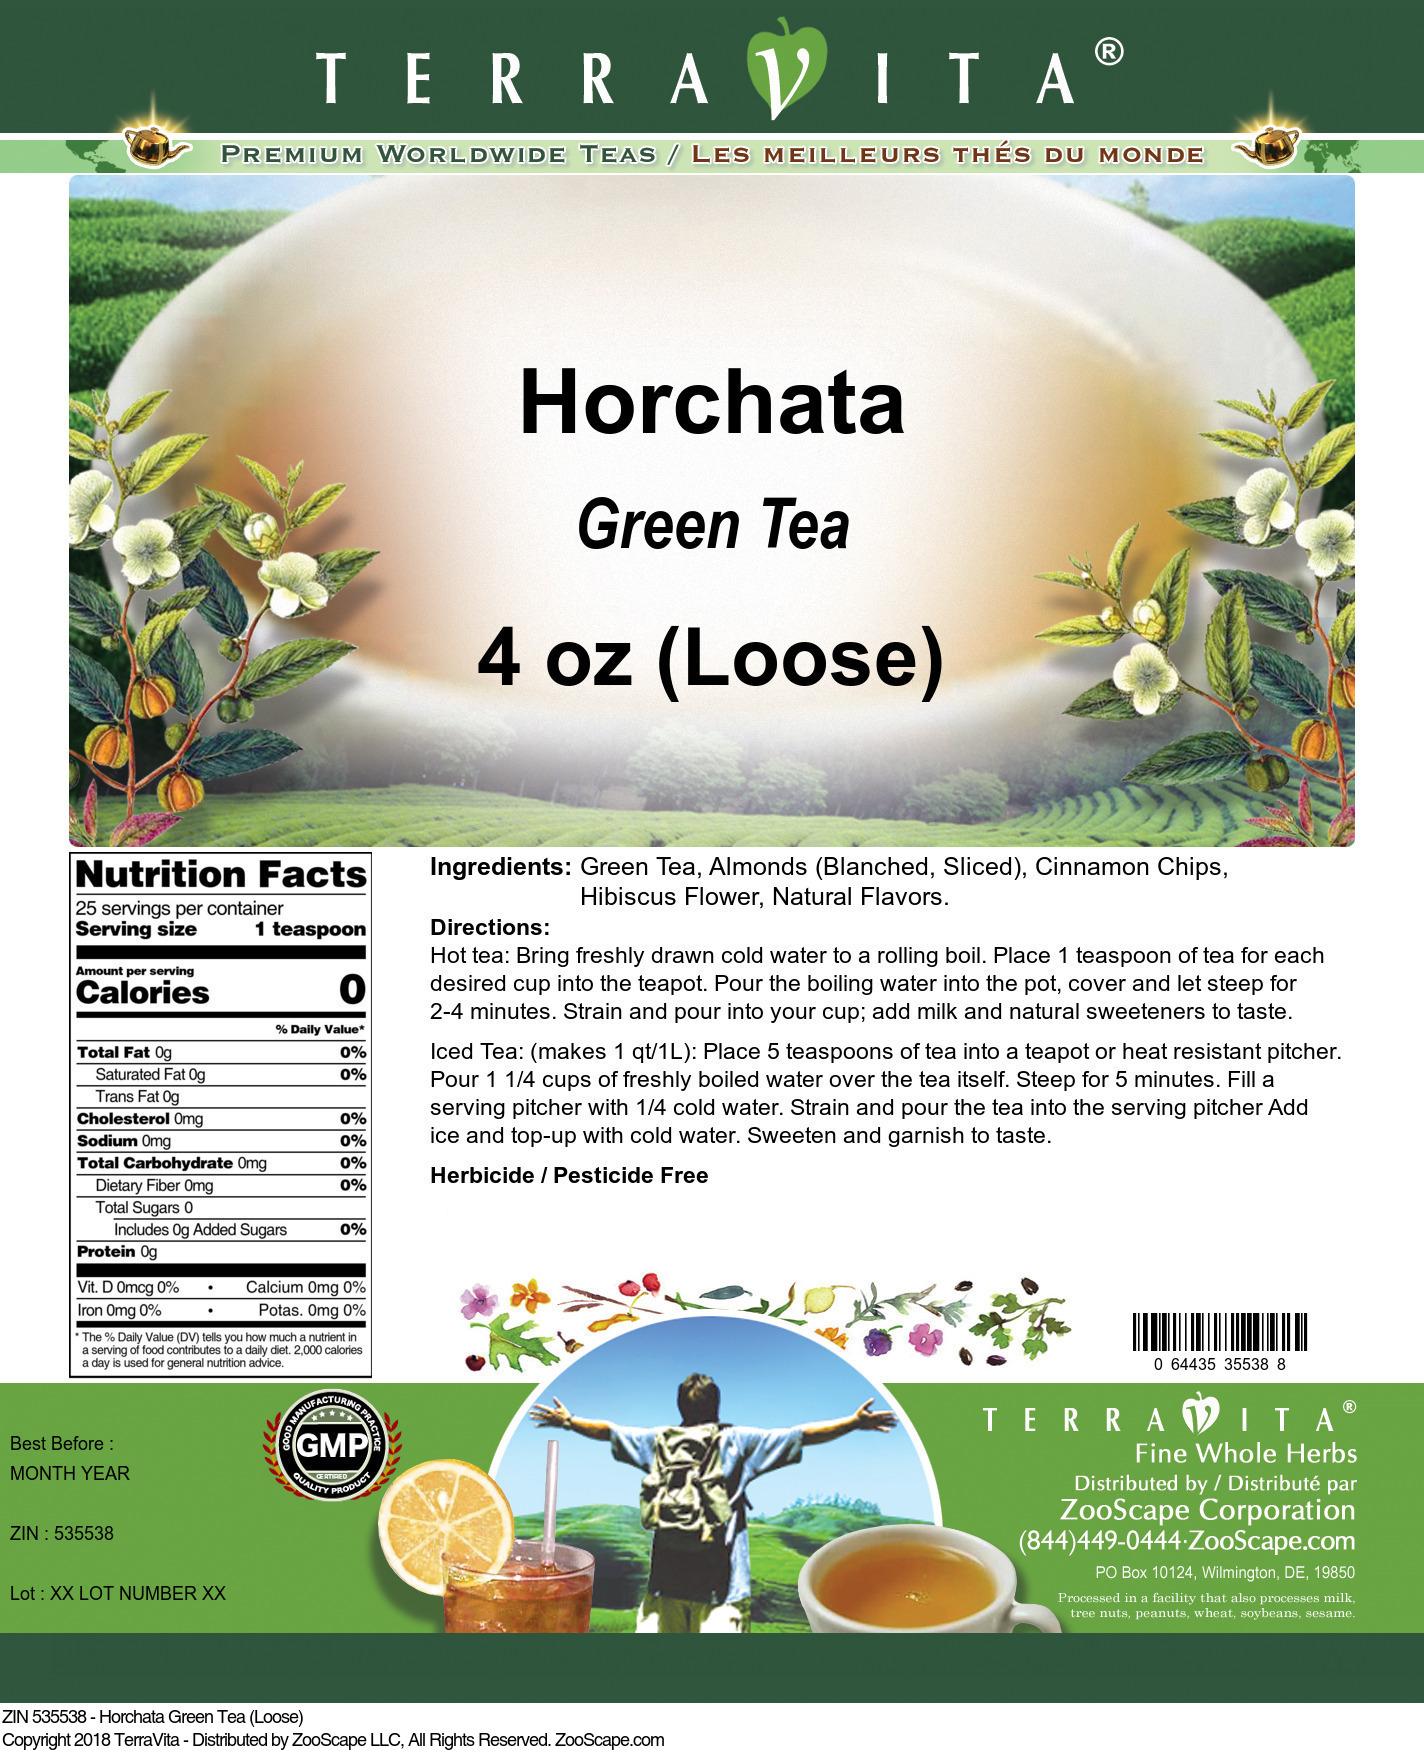 Horchata Green Tea (Loose)